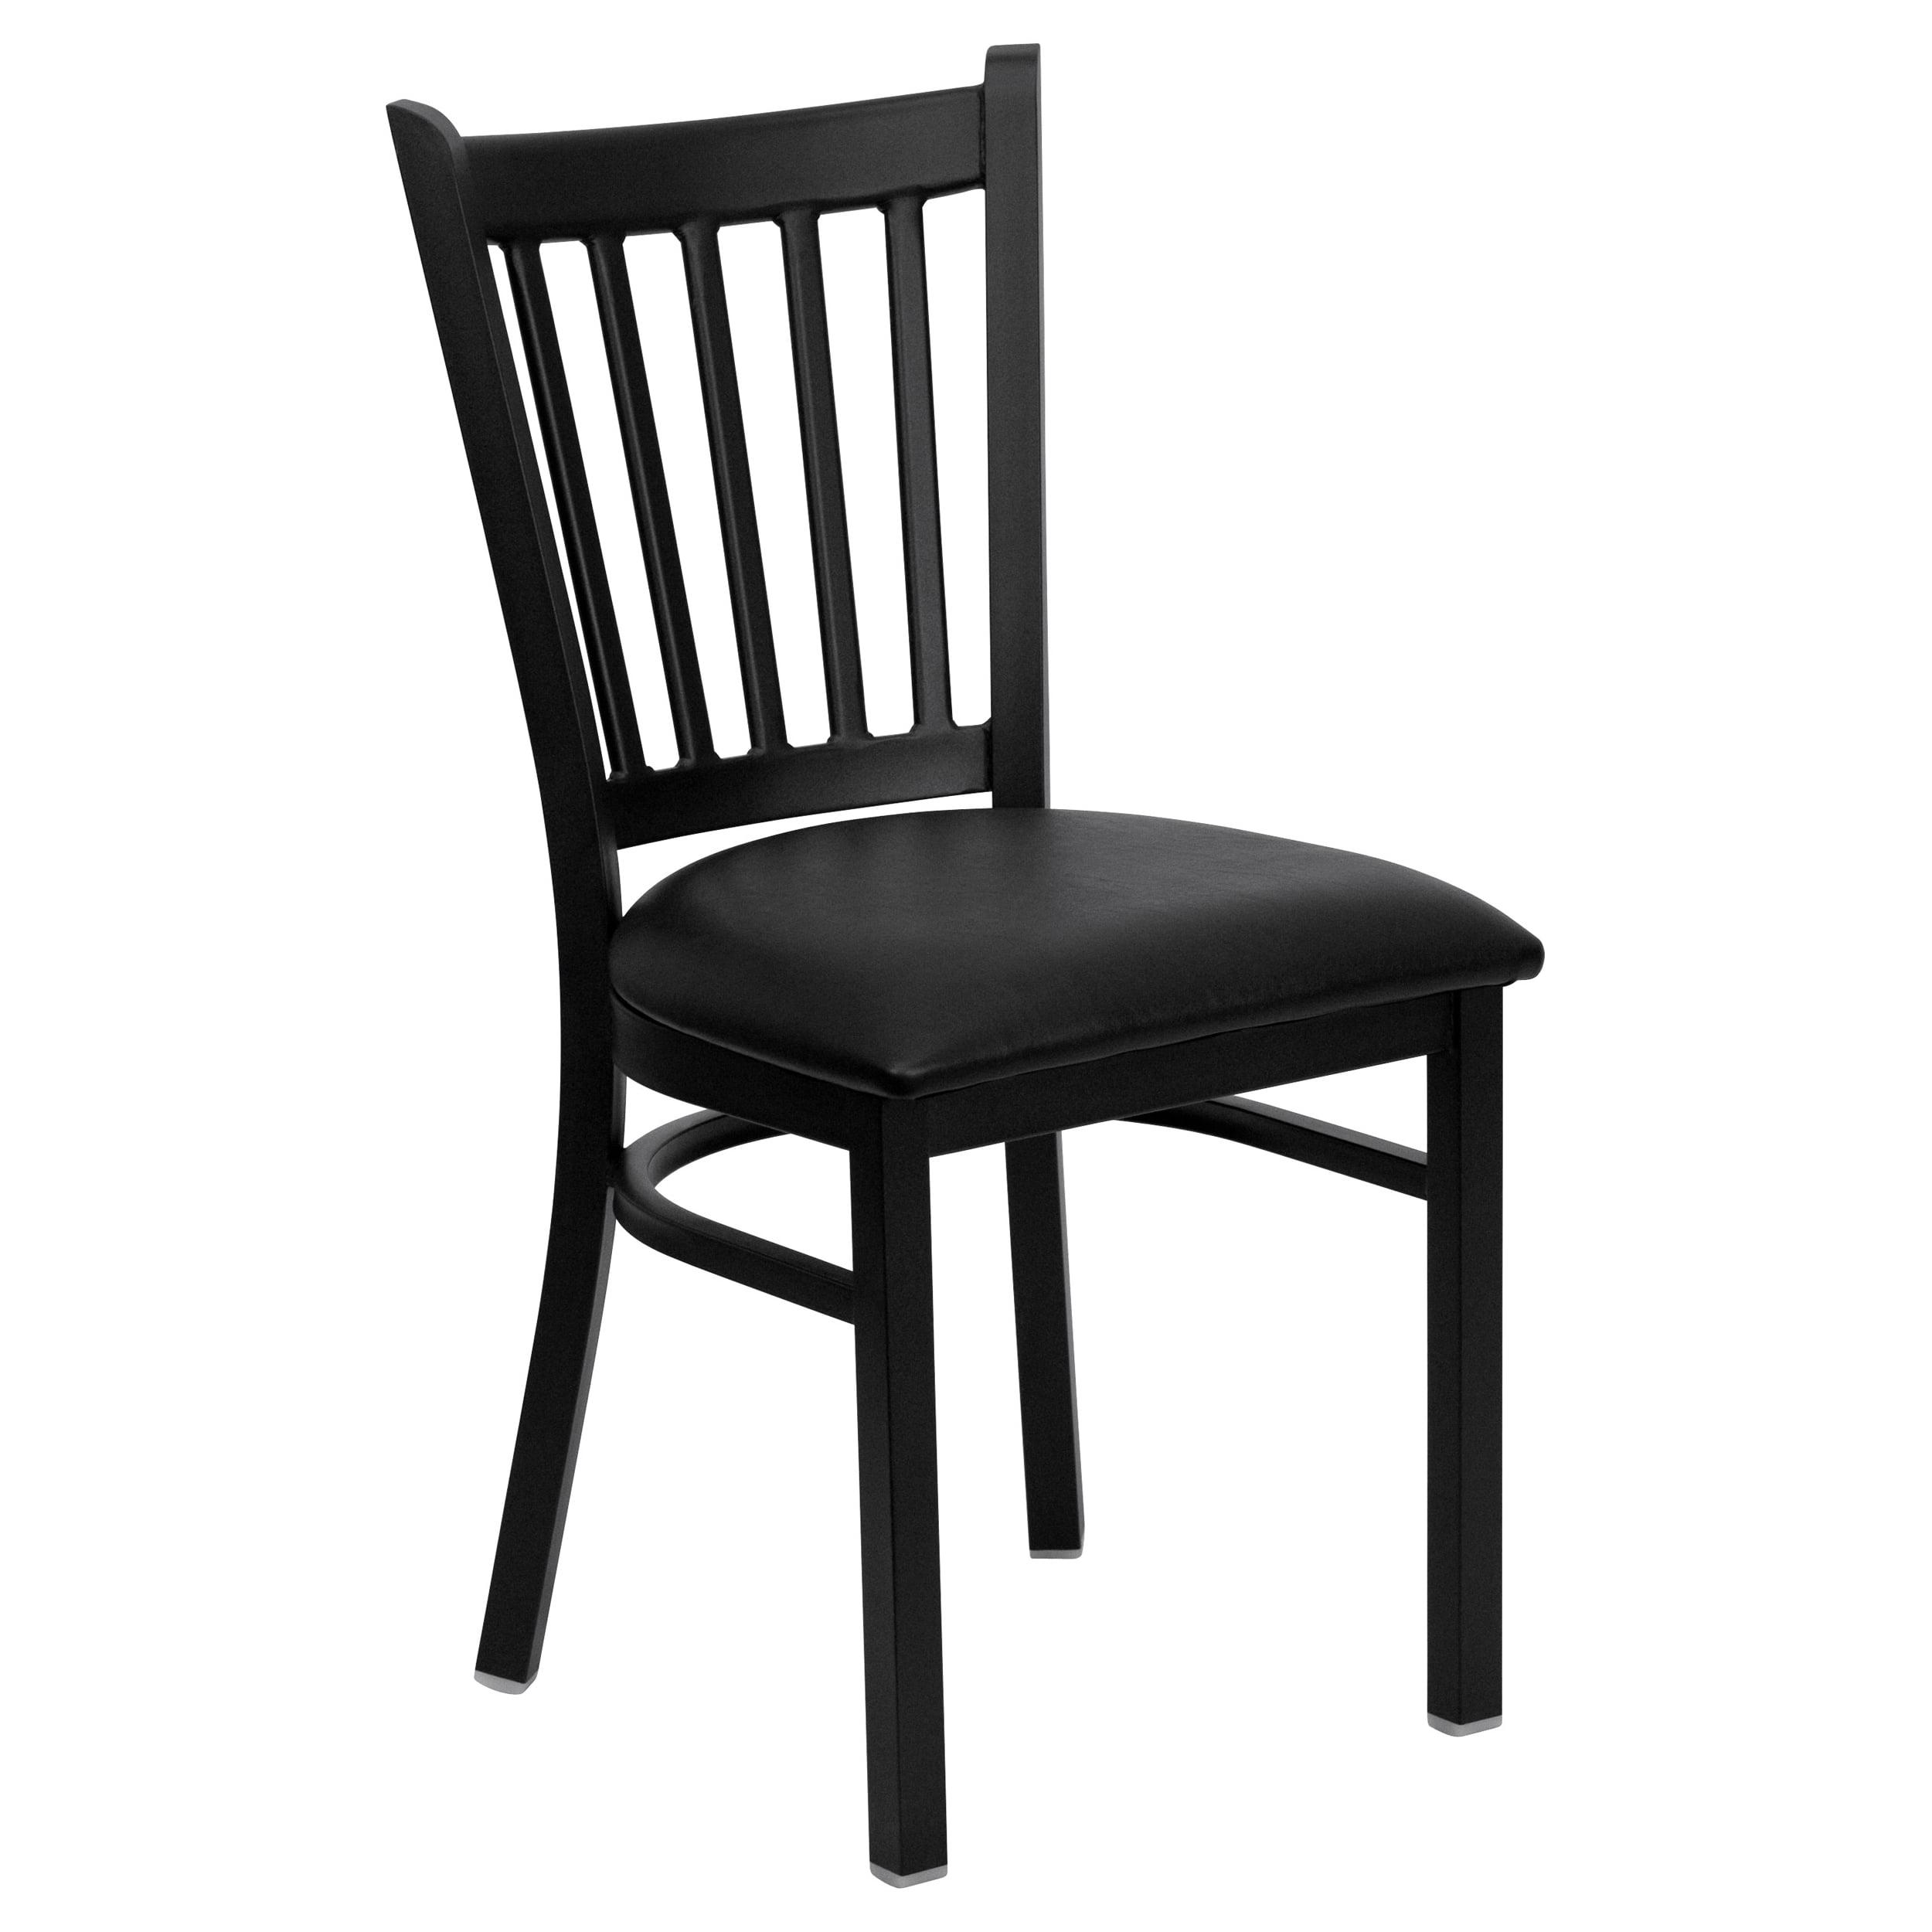 Flash Furniture HERCULES Series Black Vertical Back Metal Restaurant Chair - Vinyl Seat Multiple Colors( Base UPC:0084725401000)